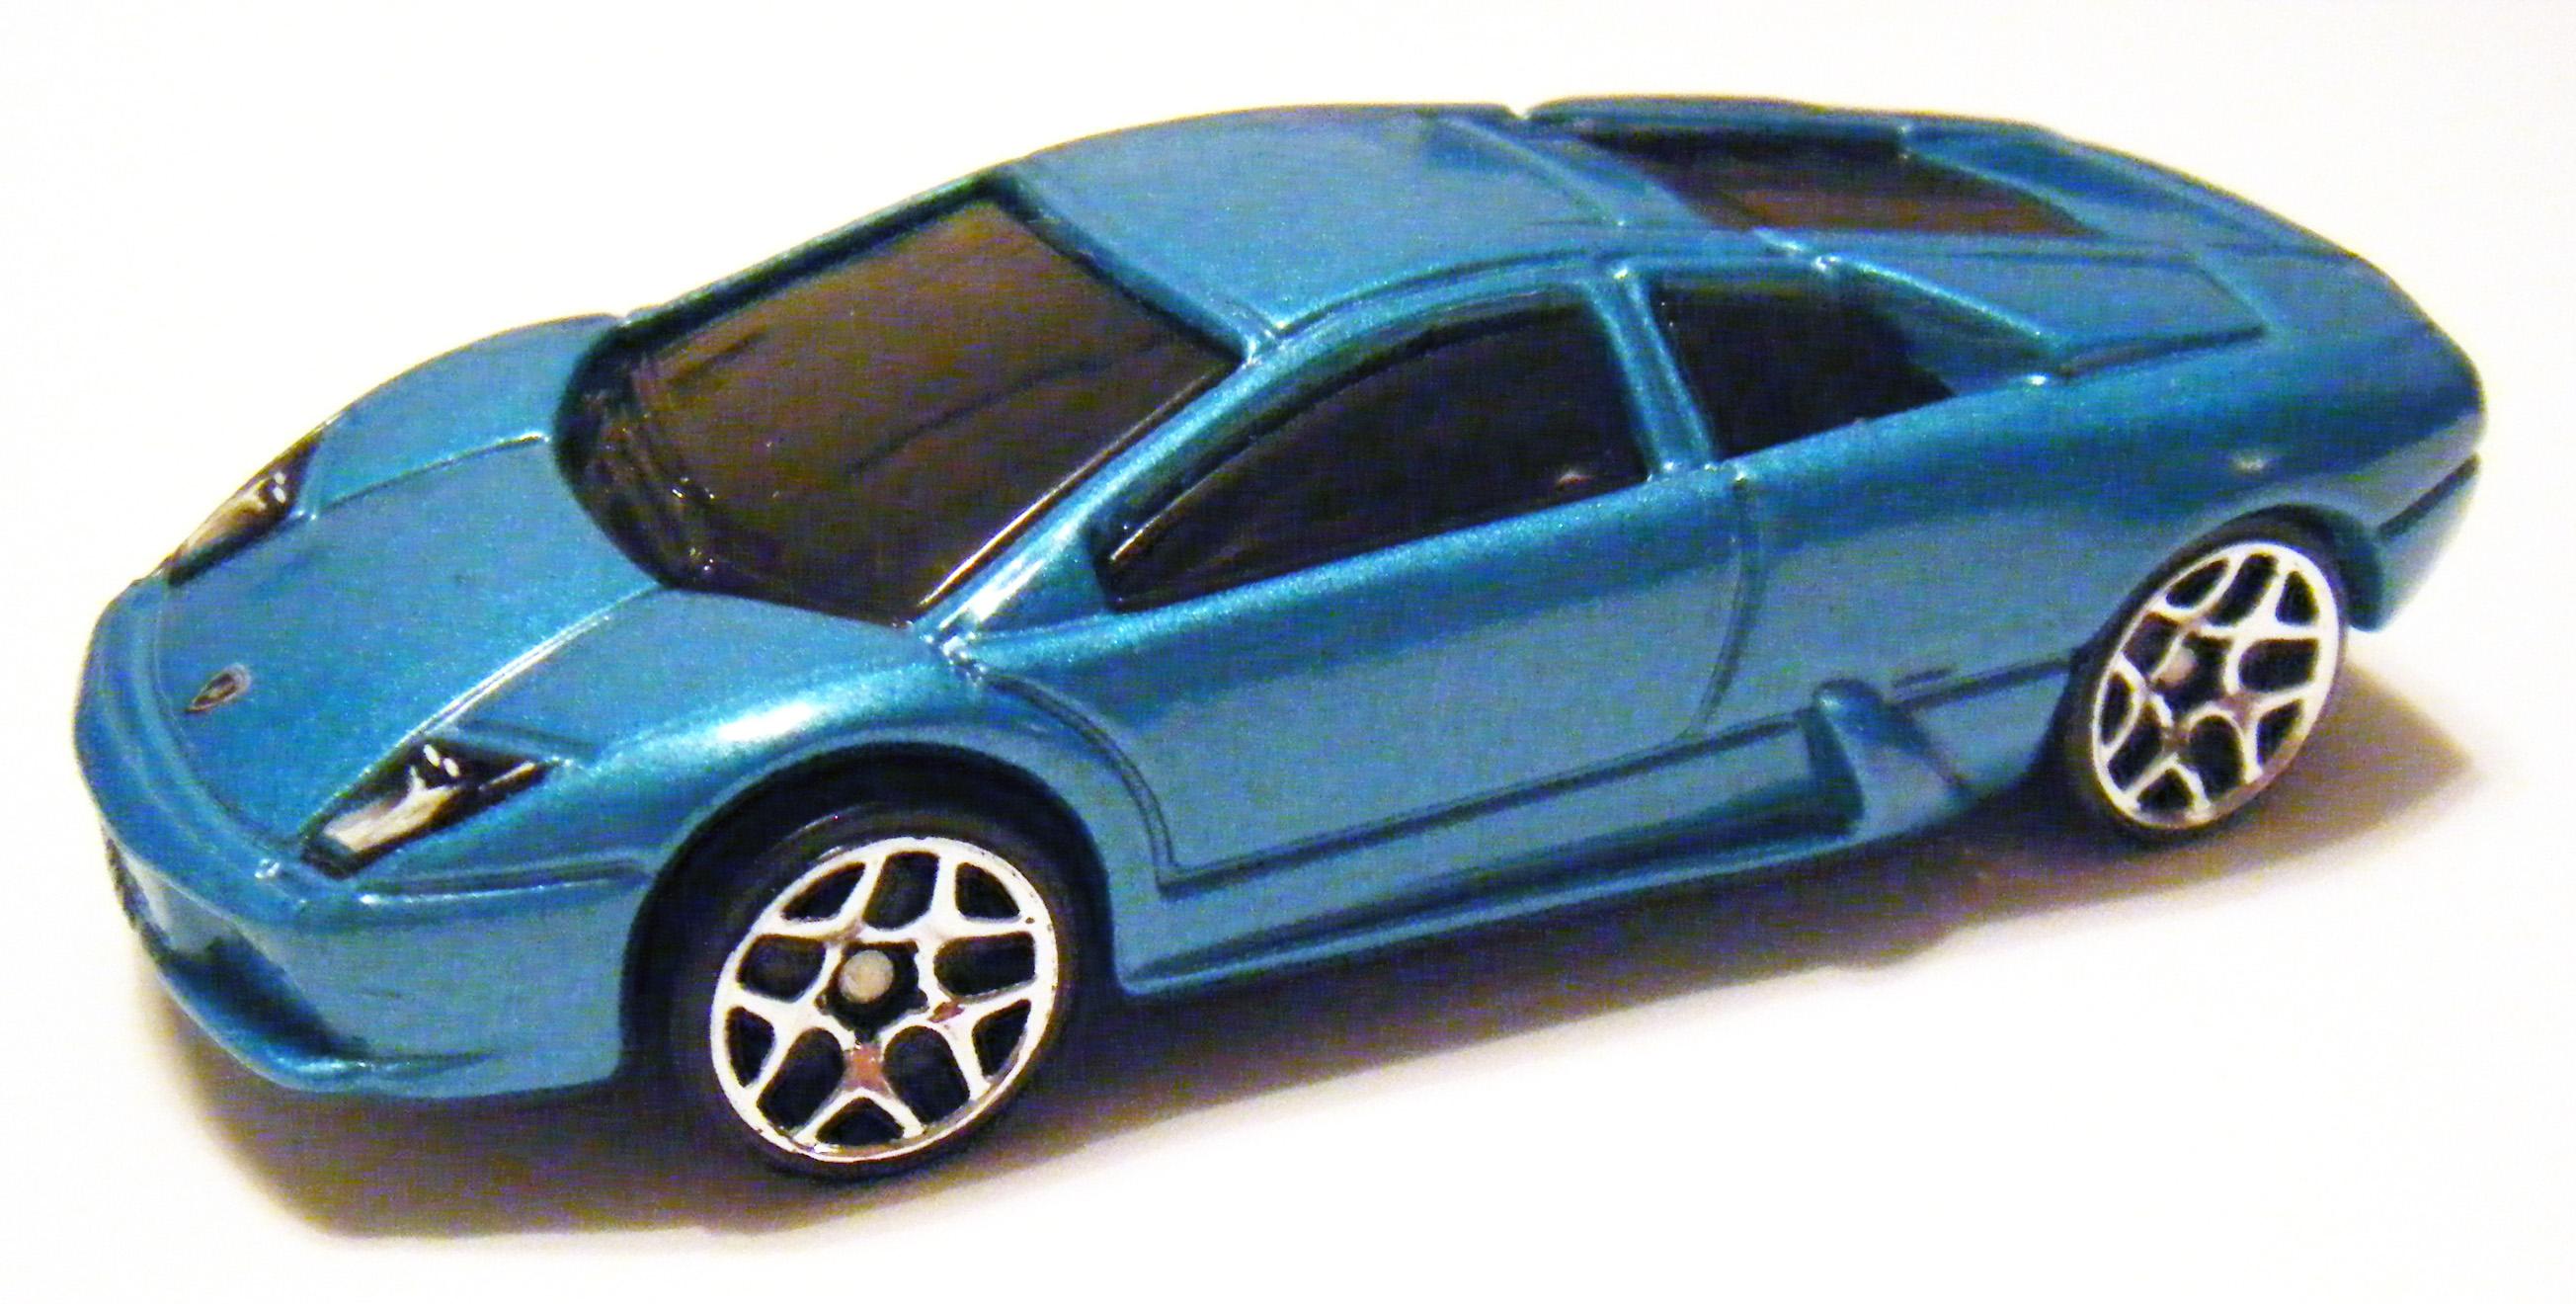 Lamborghini Murcielago Hot Wheels Claudio Blog Just Another